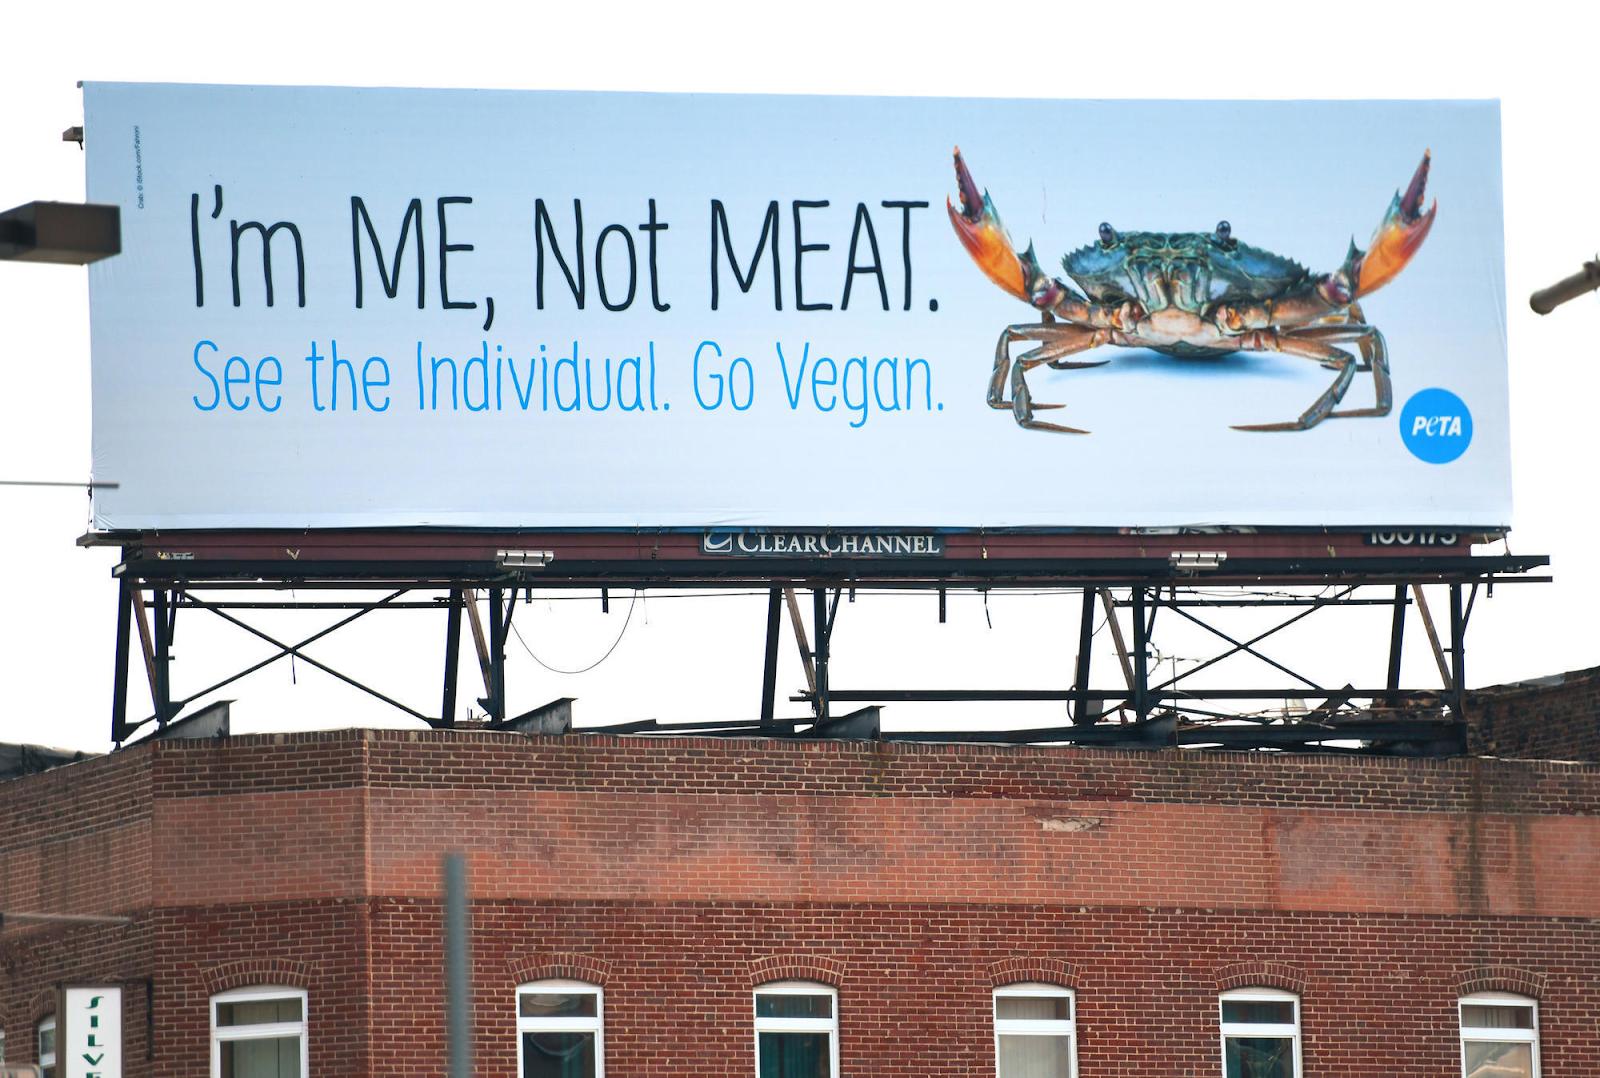 vegan psychology behind ads ooh commoot